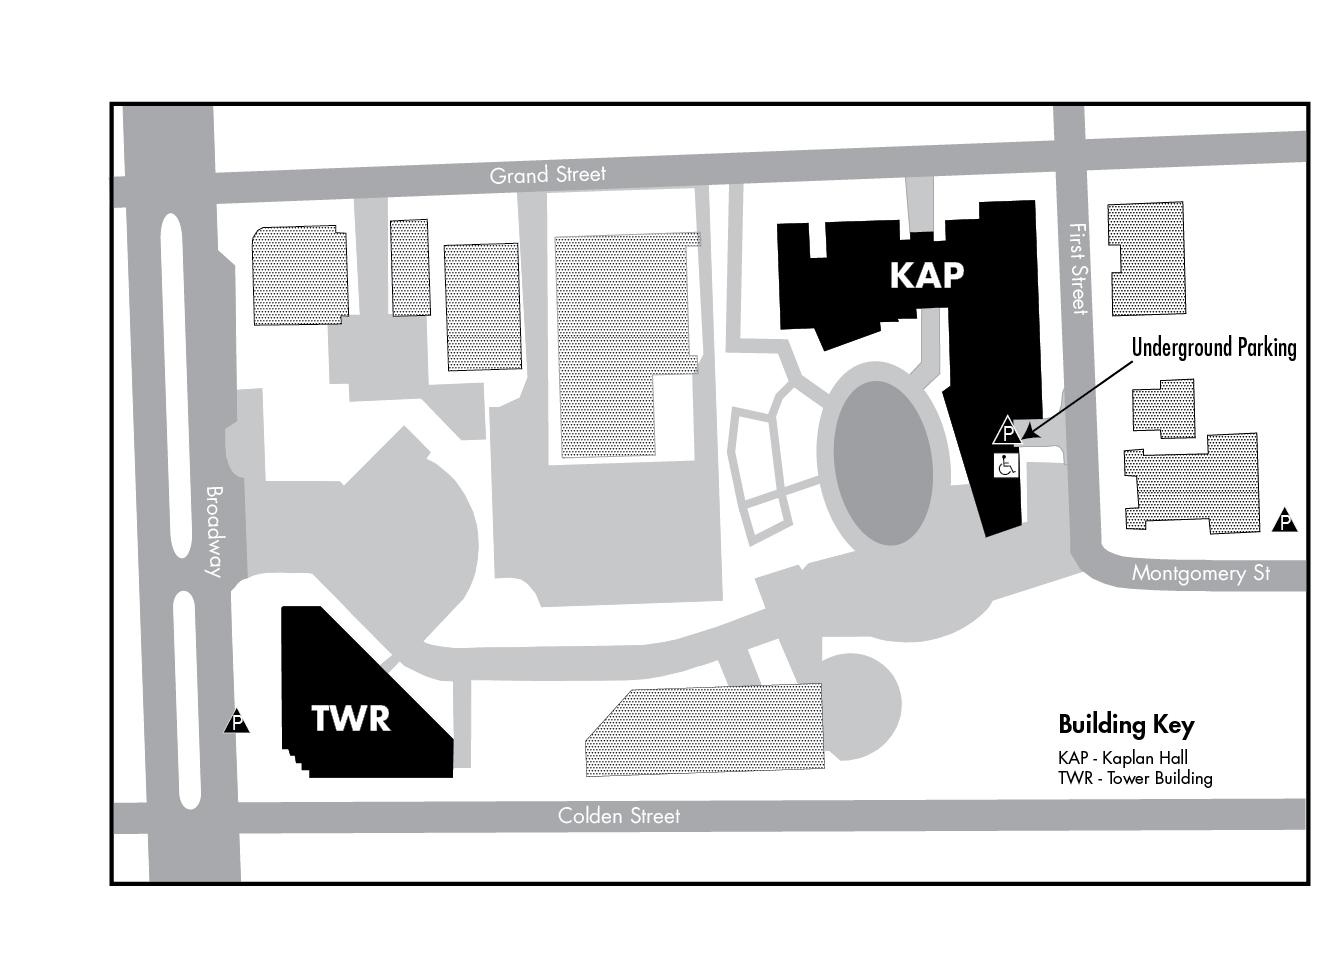 suny orange campus map Suny Orange Newburgh Campus Maps Directions suny orange campus map